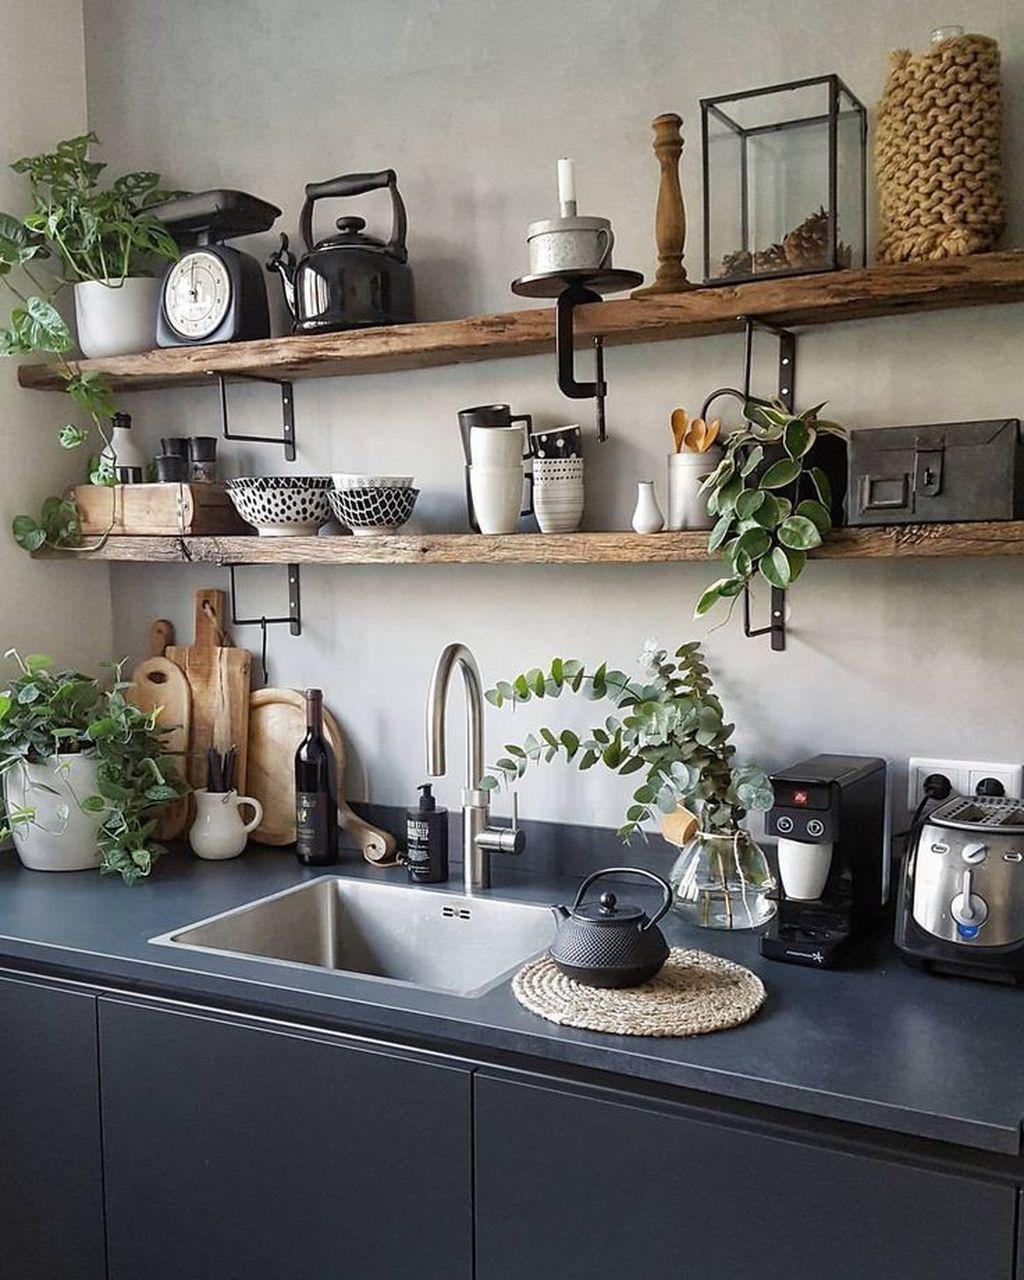 46 Cute And Small Kitchen Design Ideas